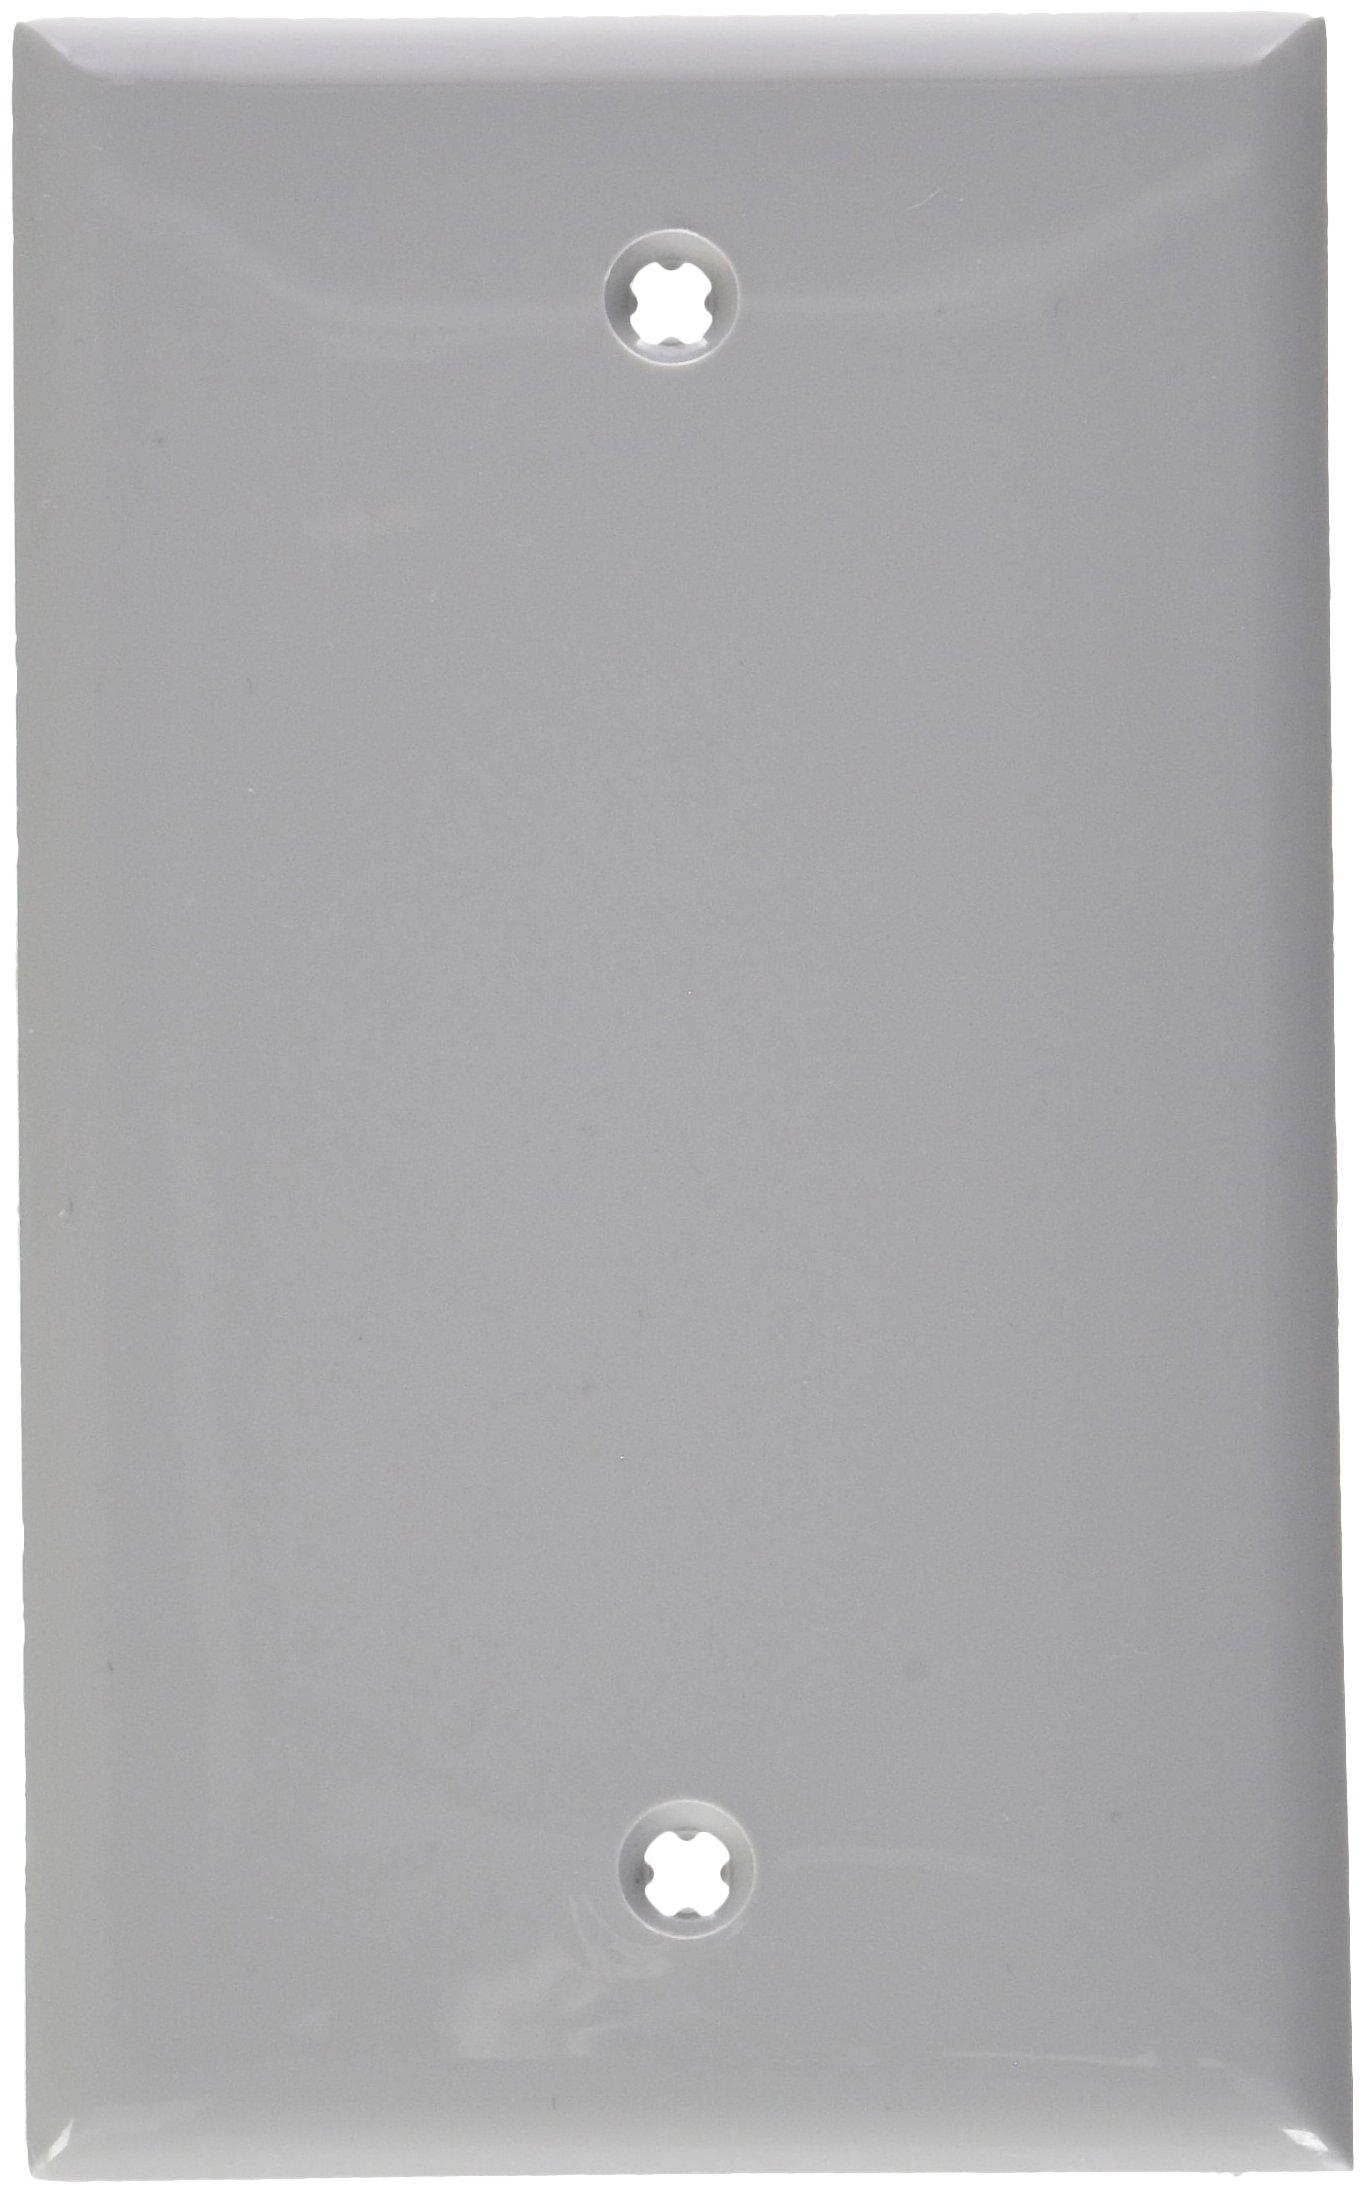 Leviton 80714-GY 1-Gang No Device Blank Wallplate, Standard Size, Thermoplastic Nylon, Box Mount, Gray, 25-Pack